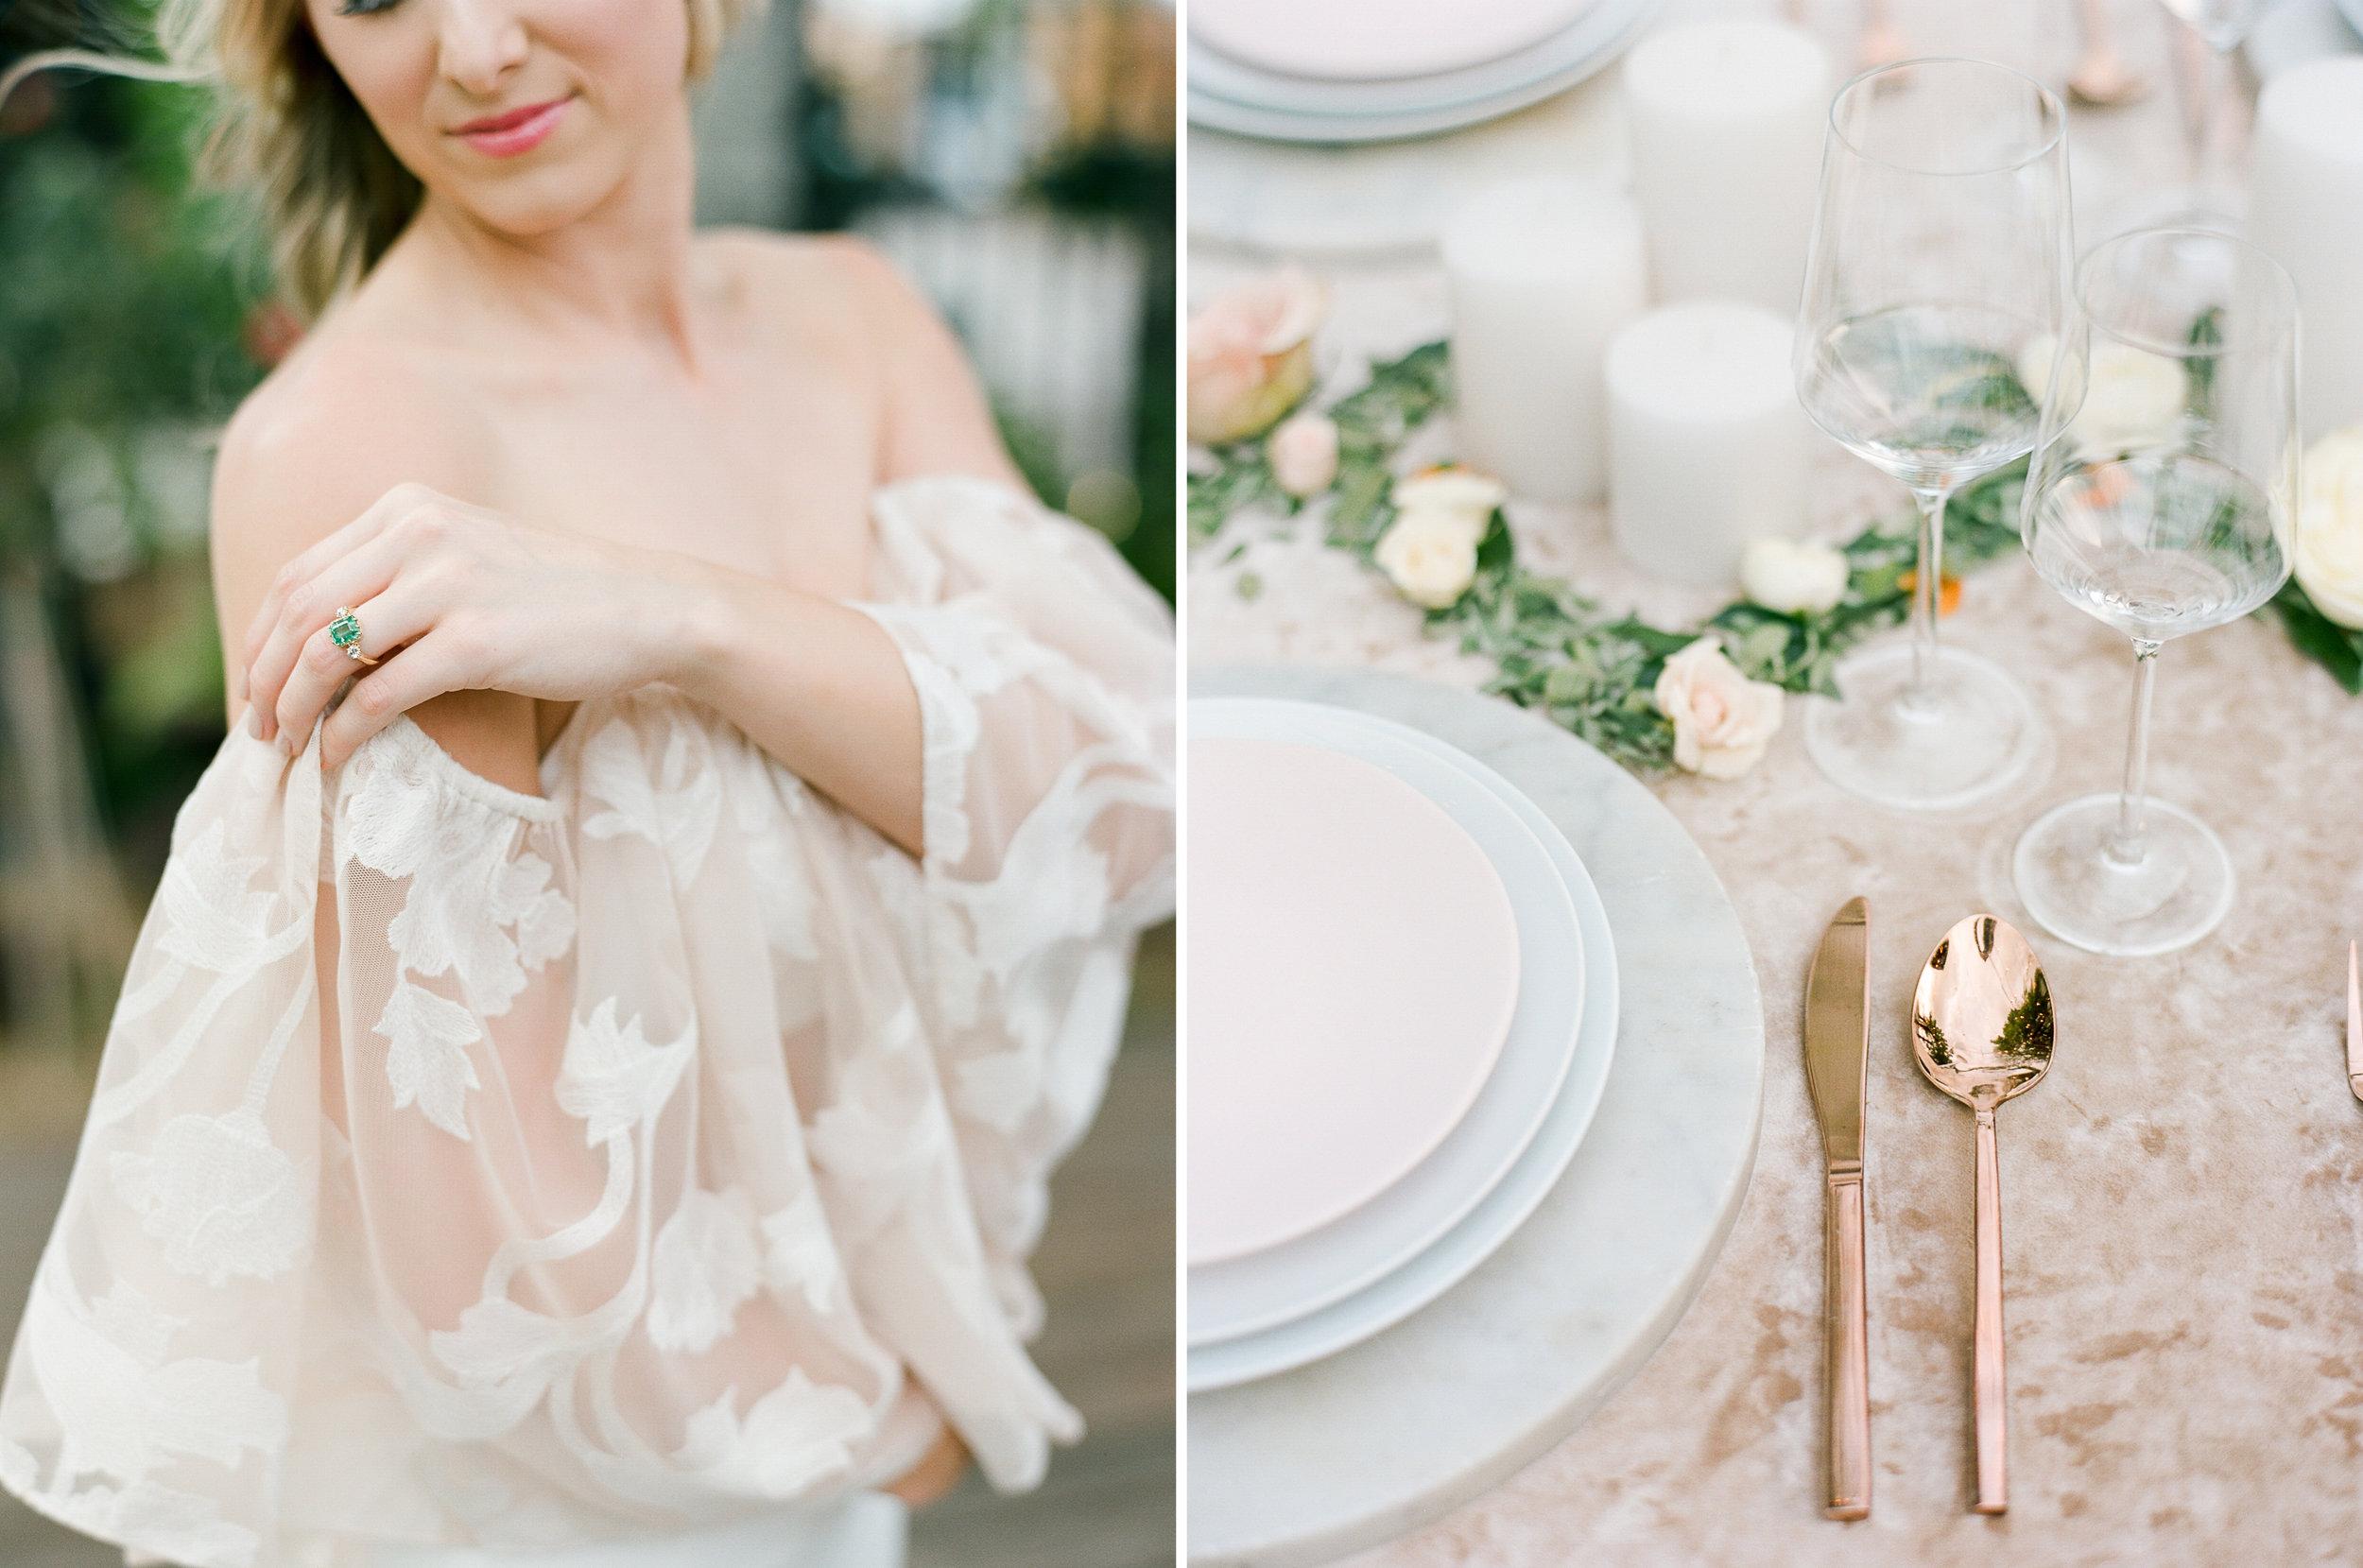 Houston-Wedding-Photographer-Fine-Art-Film-Destination-Style-Me-Pretty-Austin-Dallas-New-Orleans-Dana-Fernandez-Photography-109.jpg